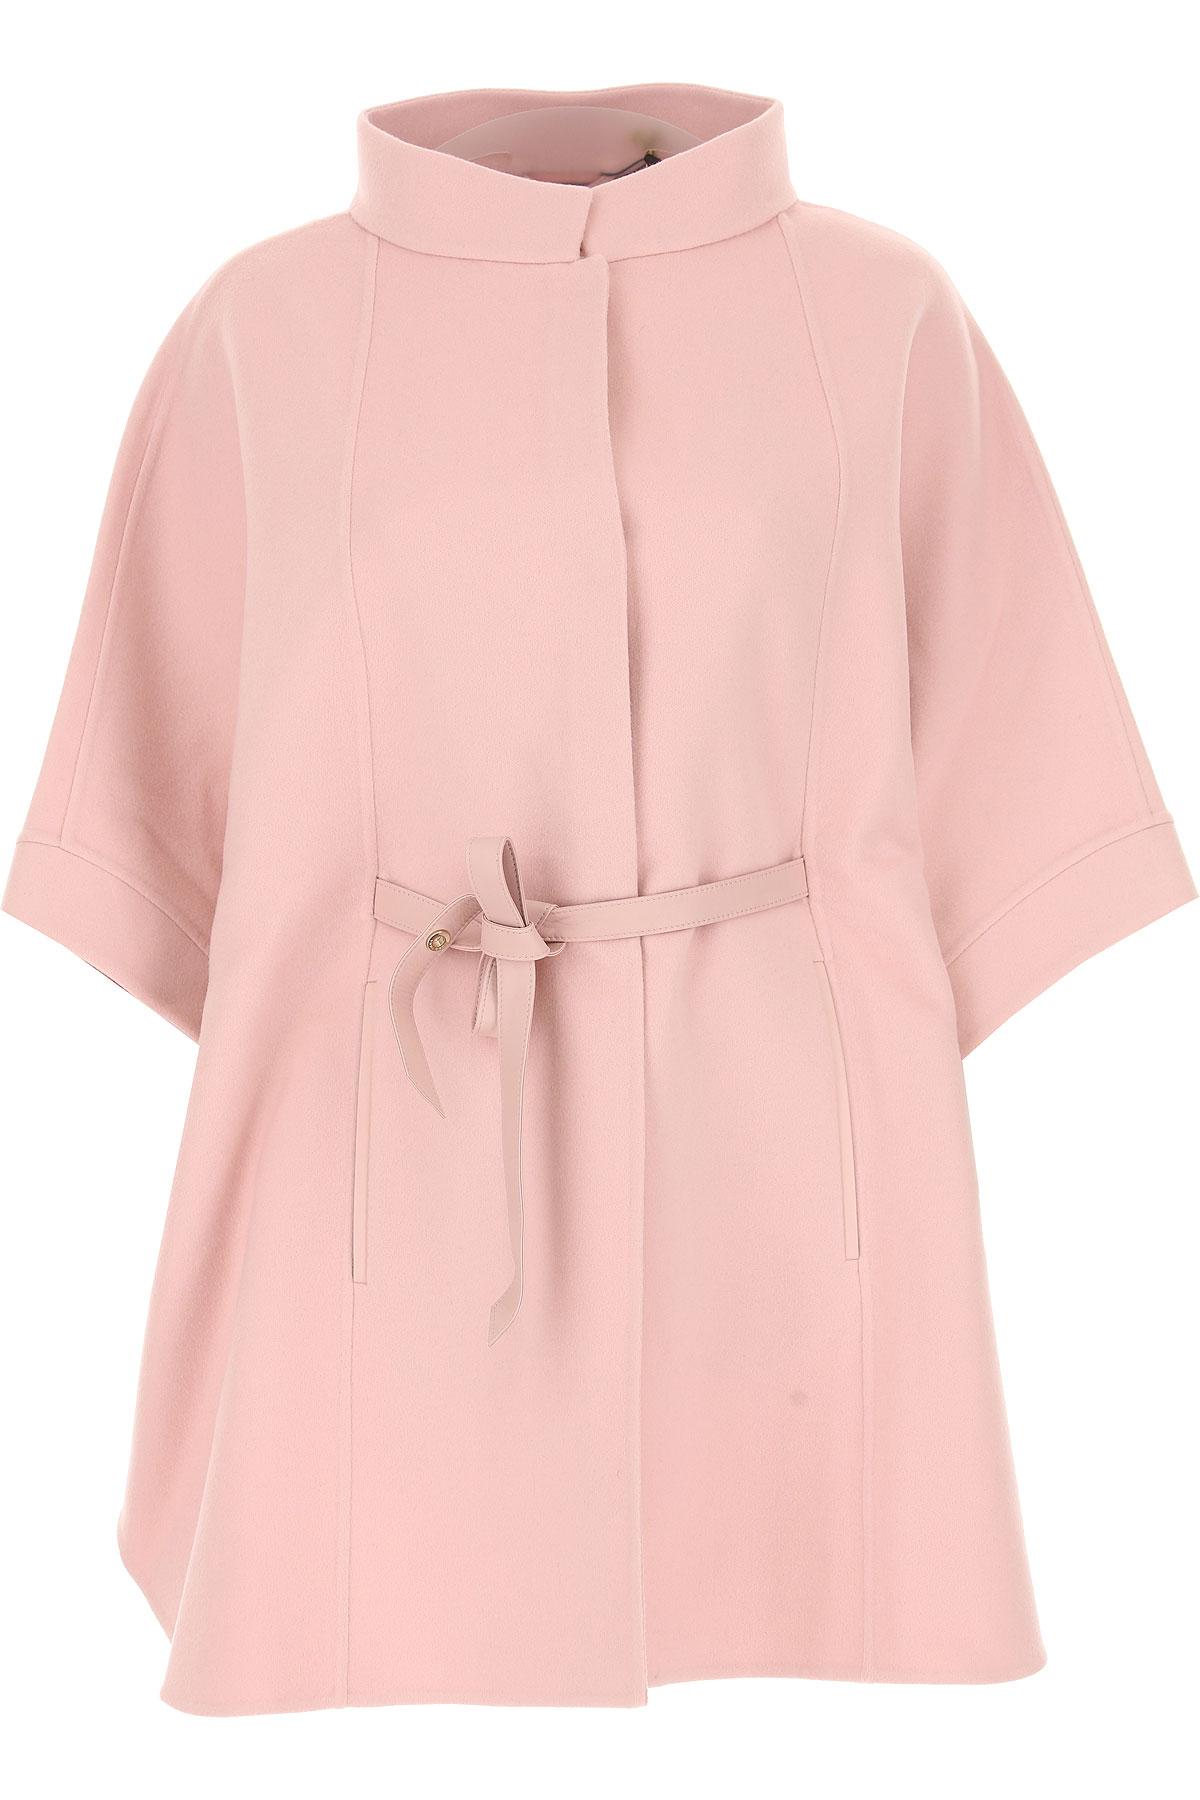 Image of Loro Piana Women\'s Coat, Pink, Cashemere, 2017, 4 6